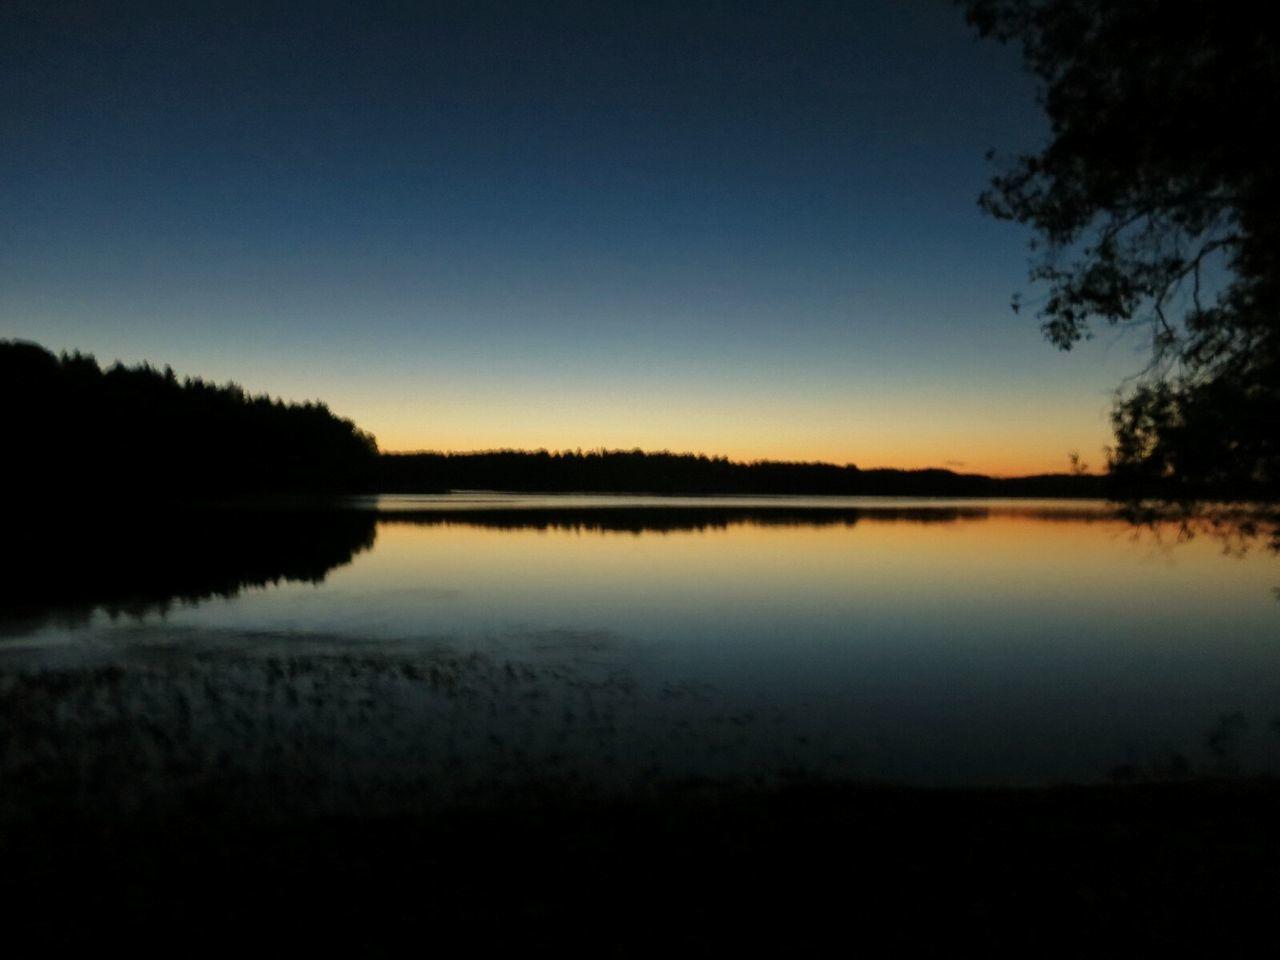 Yesterday evening around 9 o'clock PM. Evening Sky Sunset Beach Nature Reserve